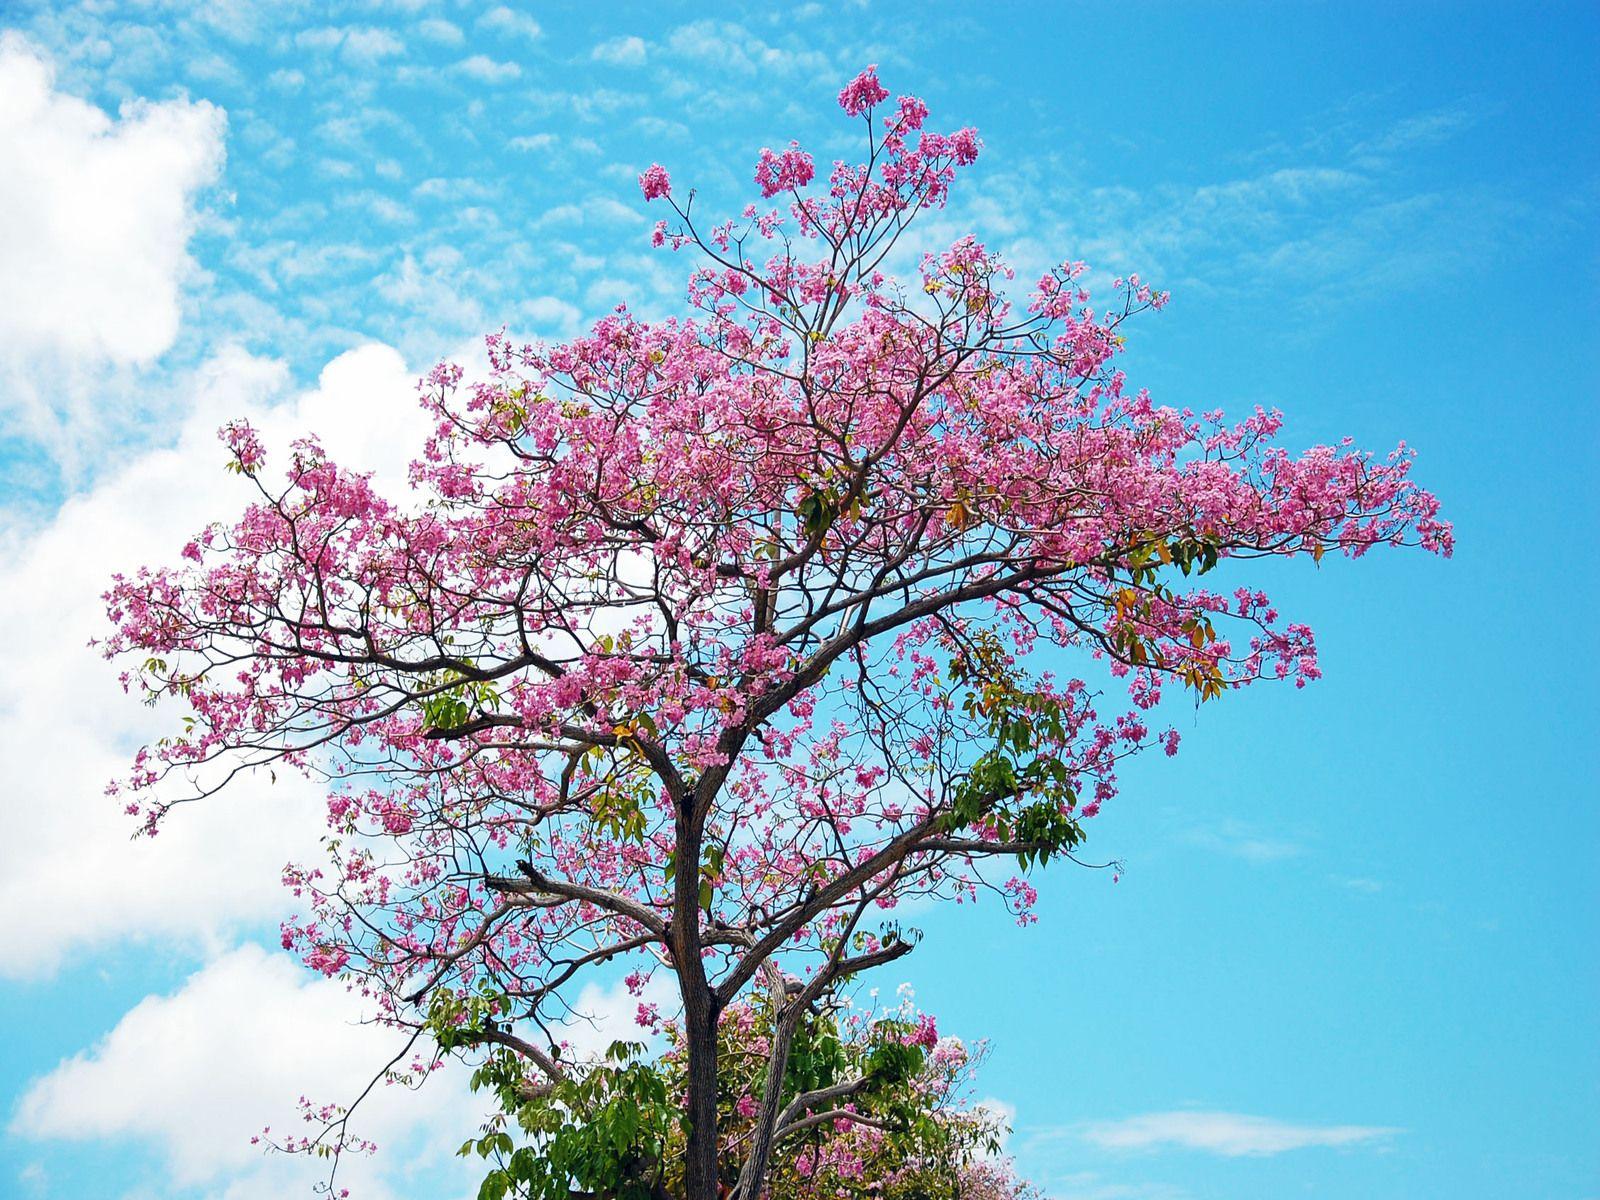 Sakura Tree Paris In The Springtime In 2019 Pinterest Blossom